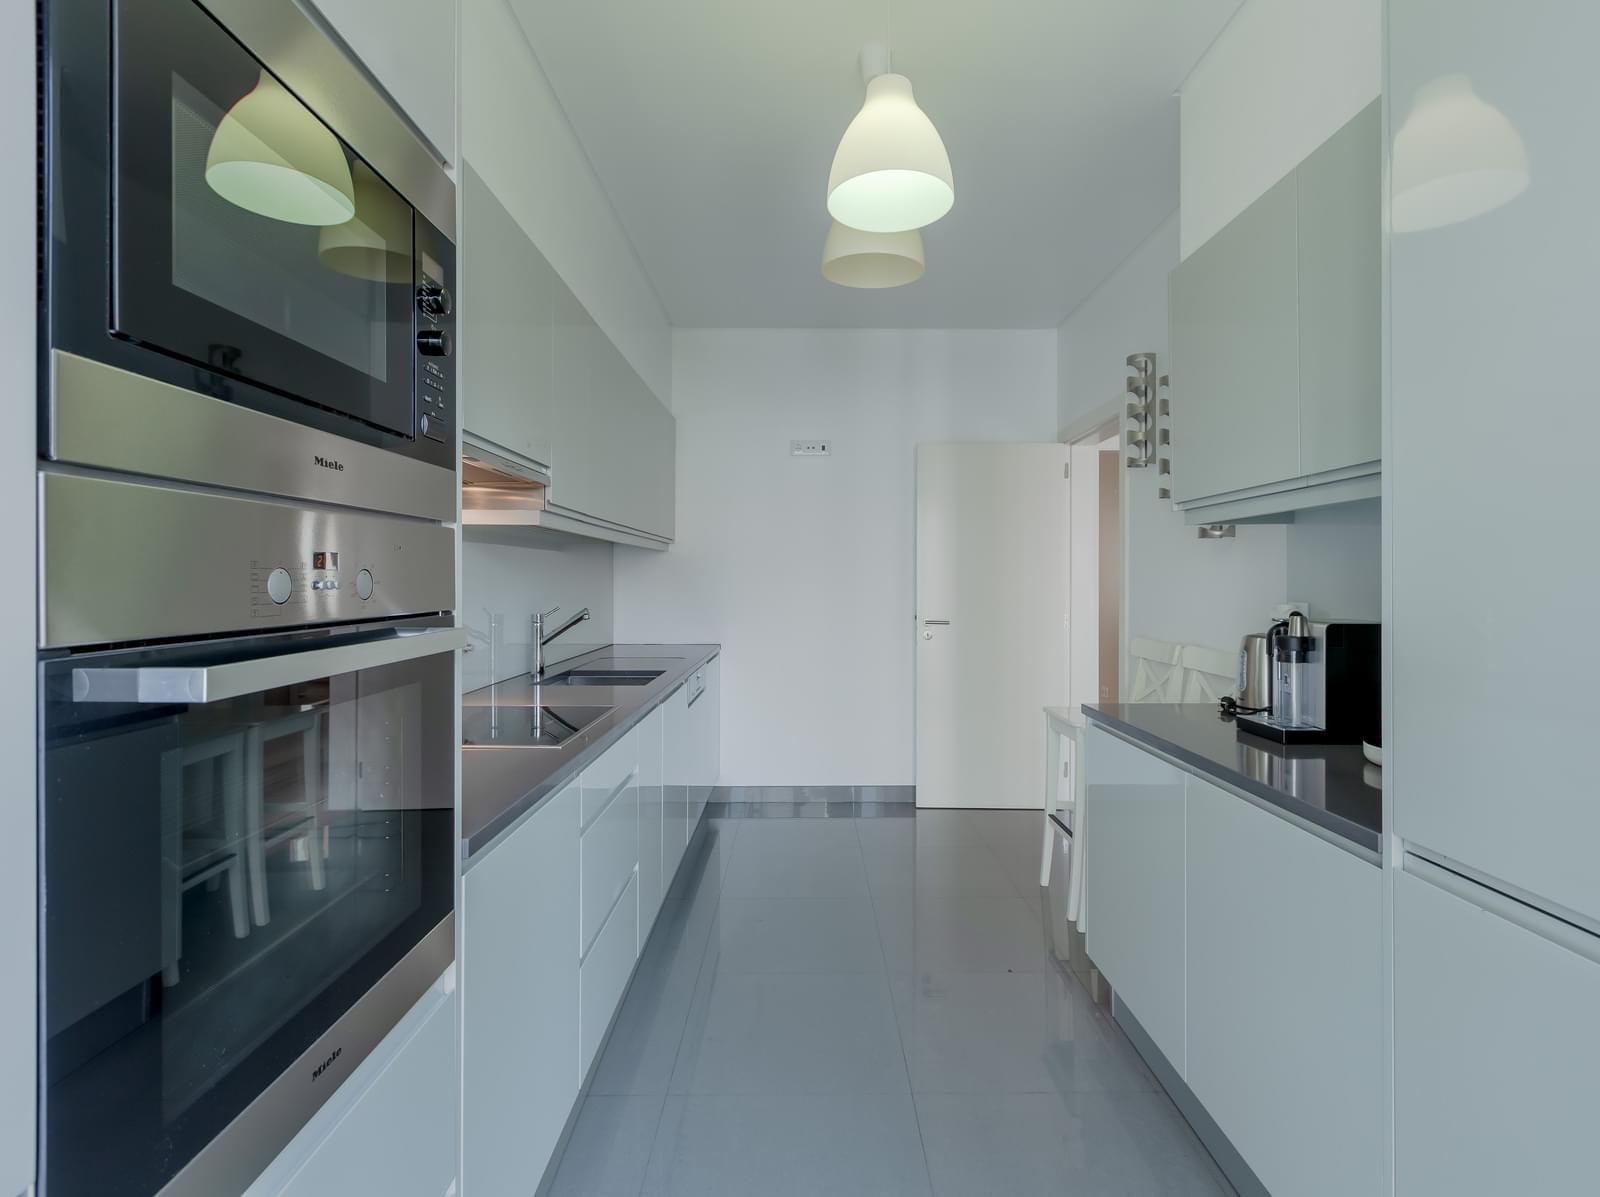 pf18160-apartamento-t2-lisboa-14fdb670-648e-431b-8954-f85839ac3064